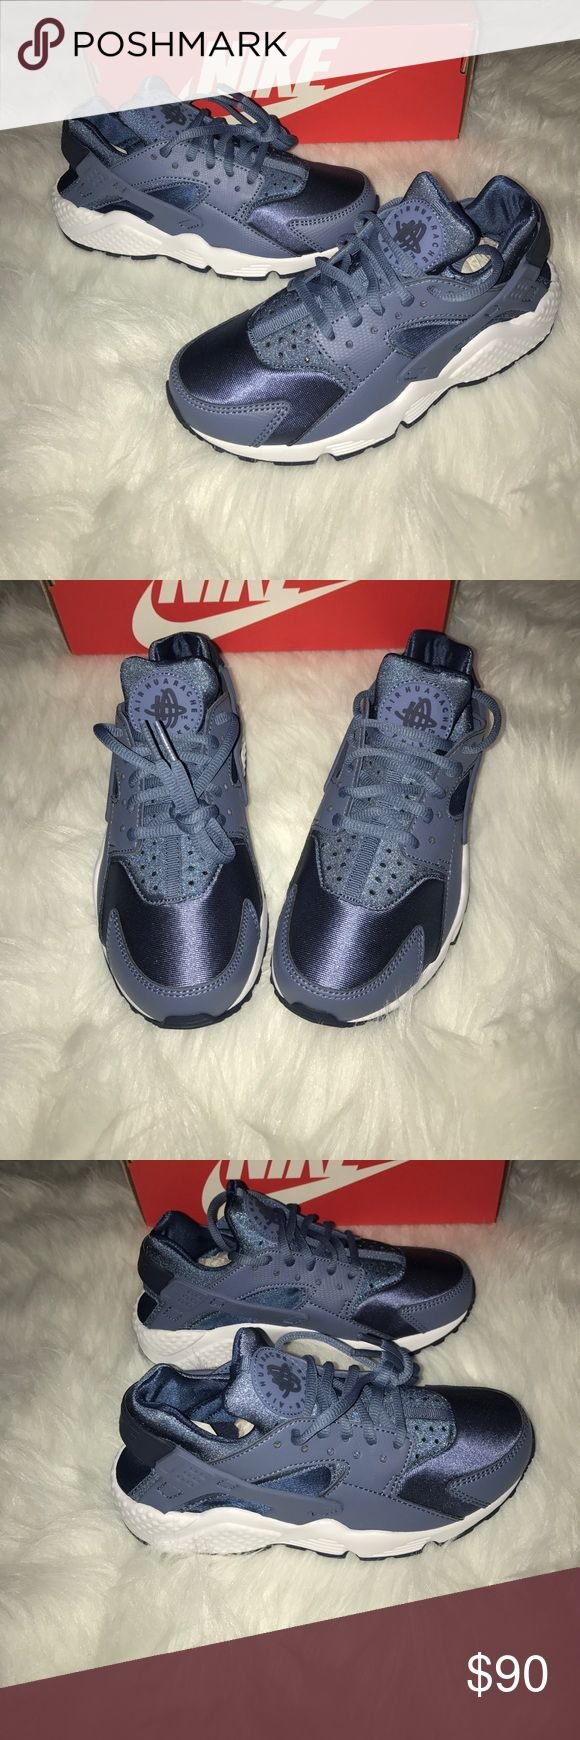 New women's Nike air huarache run size 5 New women's Nike air huarache run size 5 Nike Shoes Sneakers